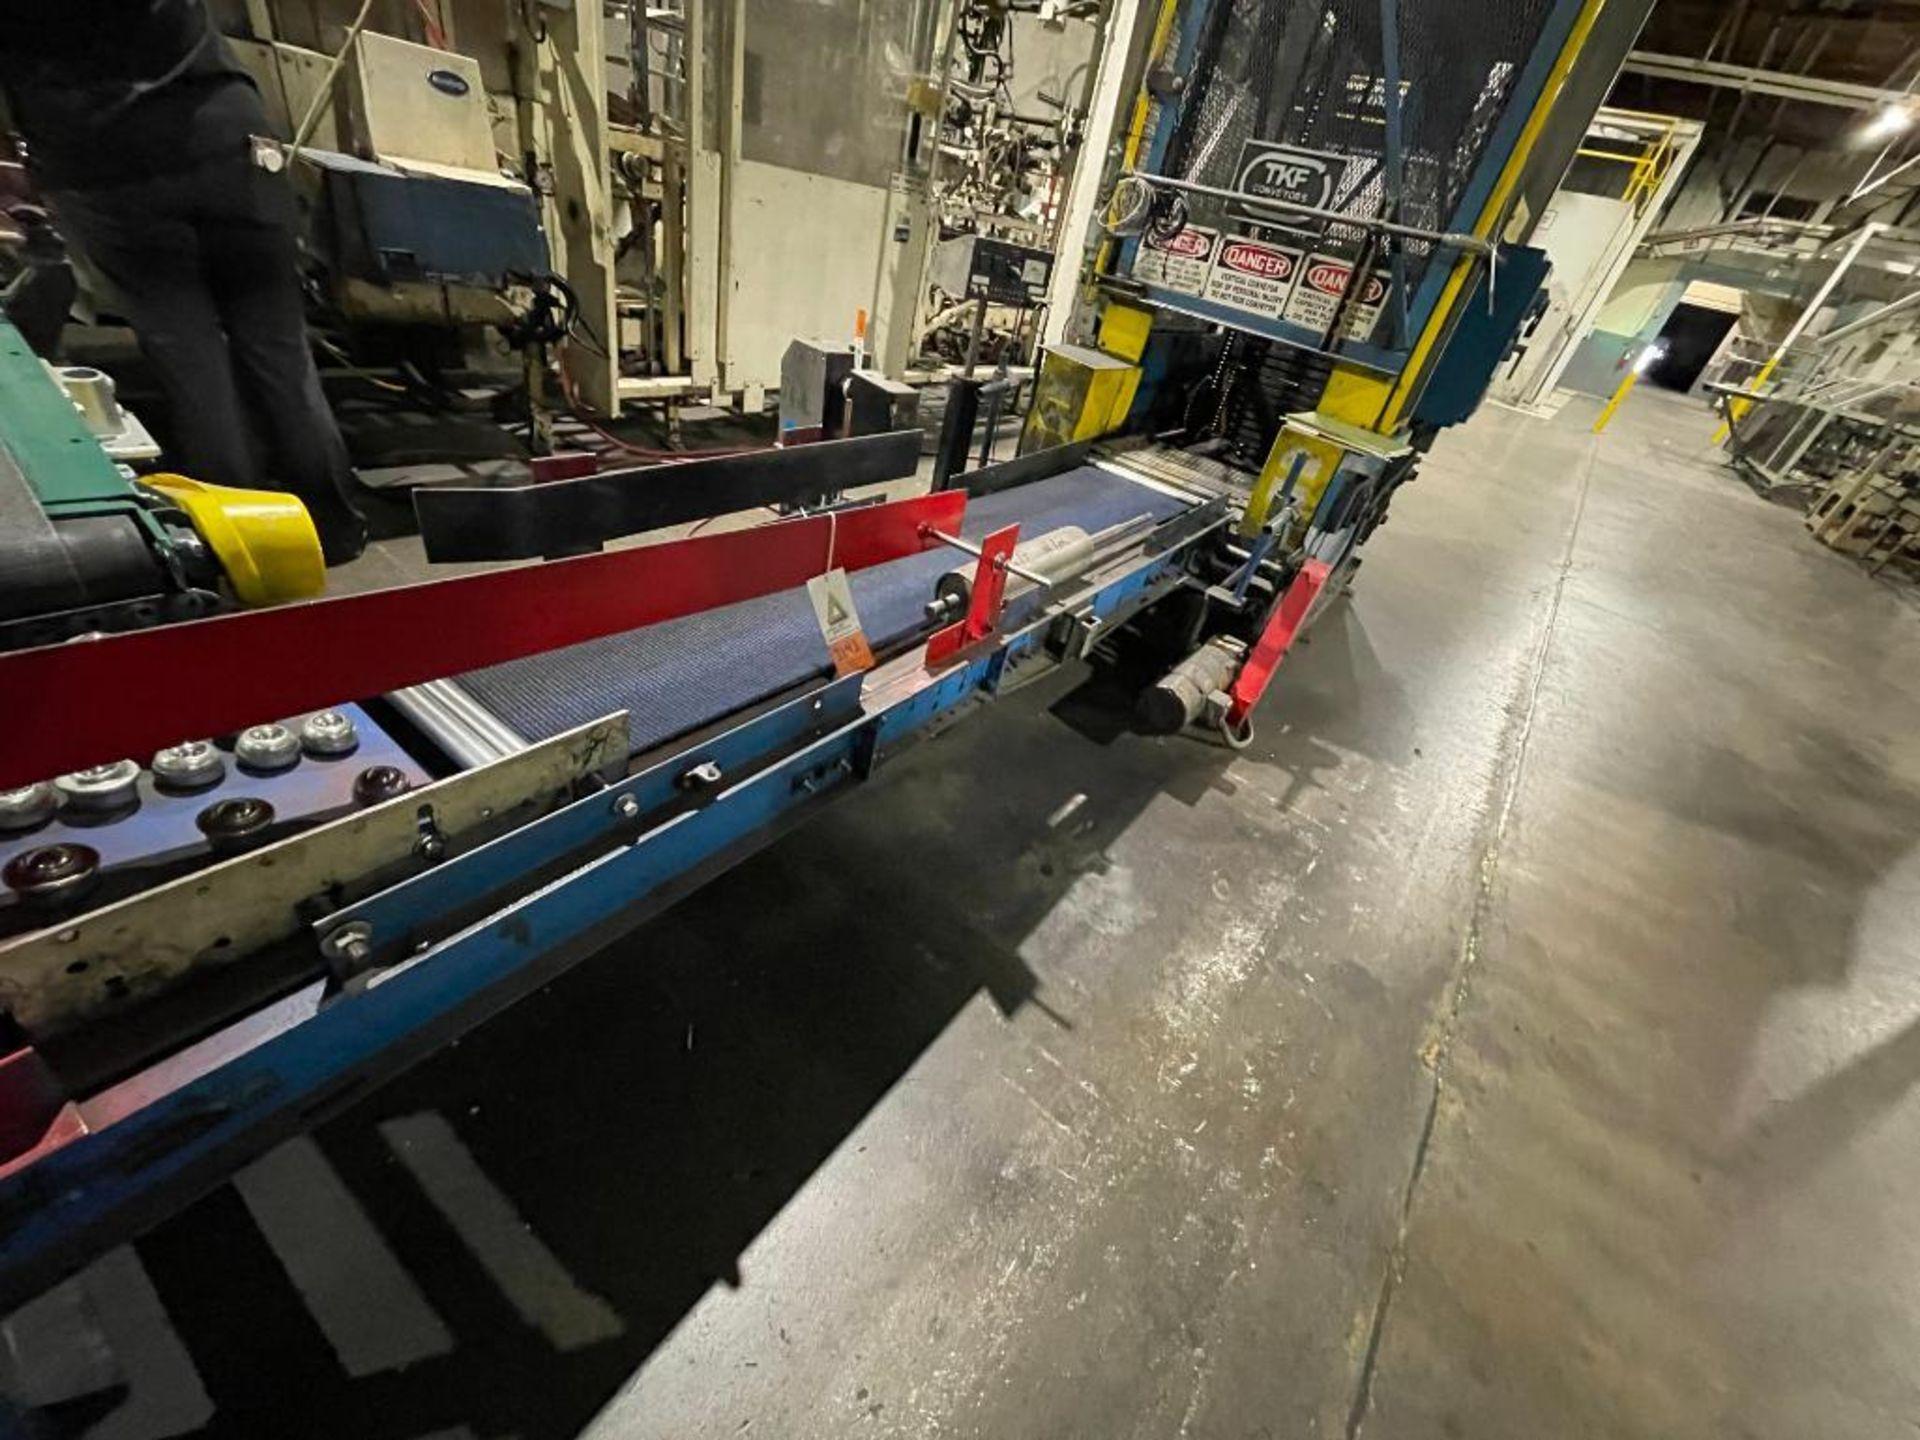 mild steel conveyor - Image 4 of 11